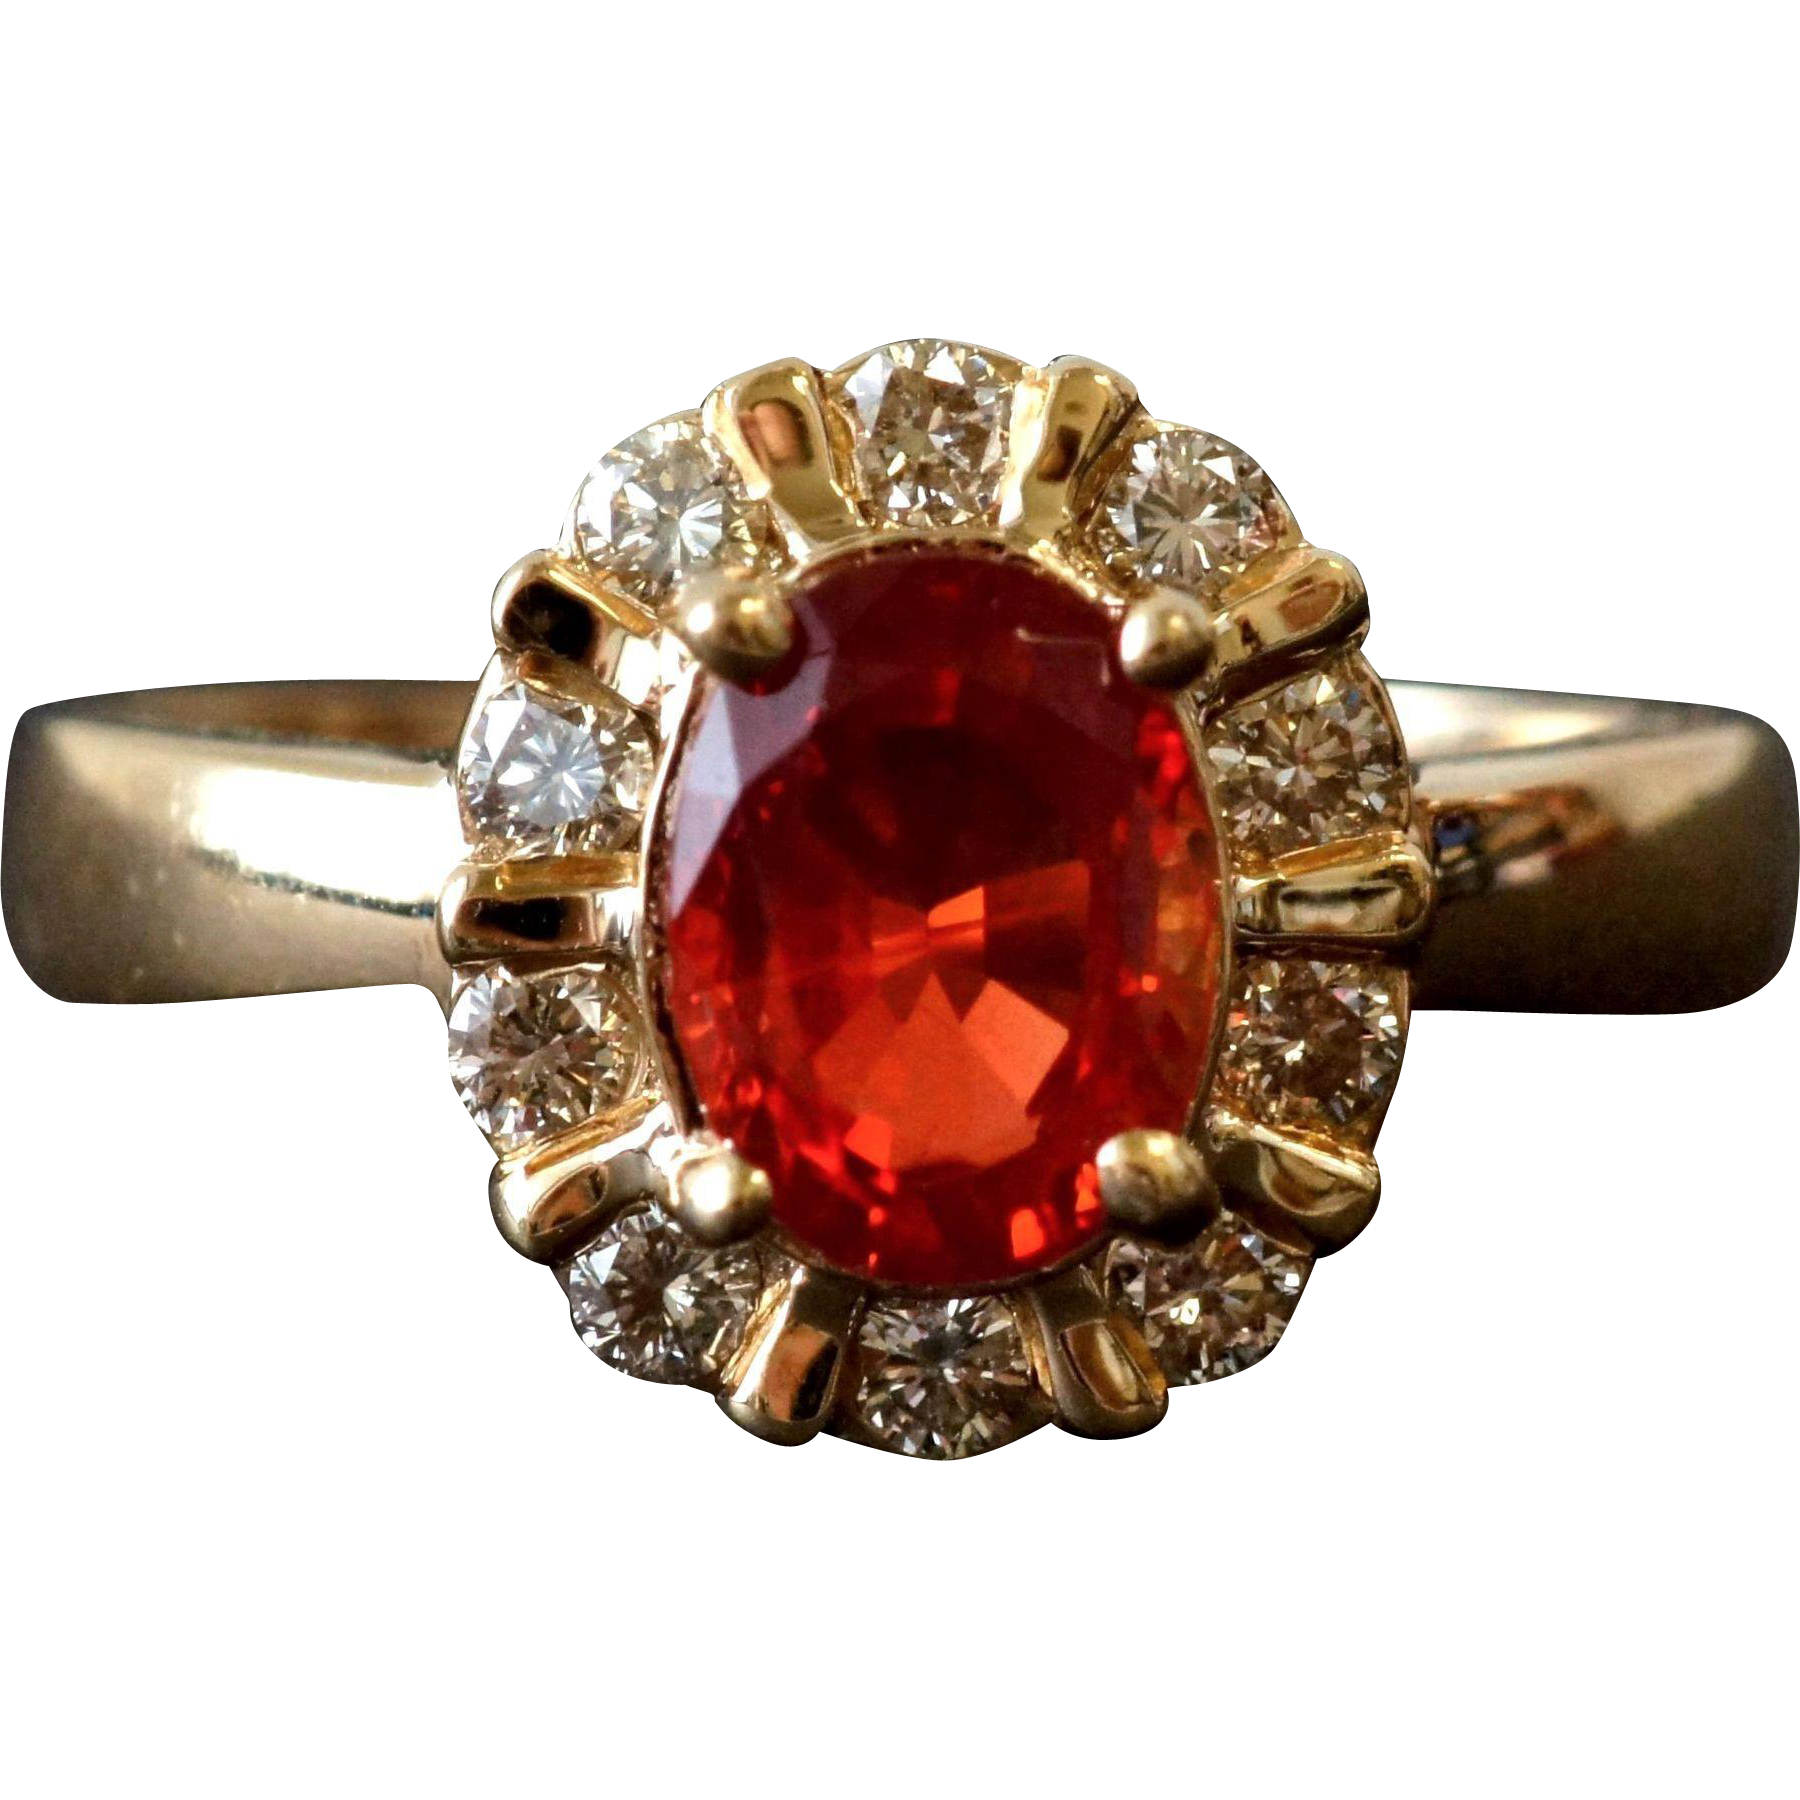 Fun Orange Andesine and Diamond Ring in 14K Gold